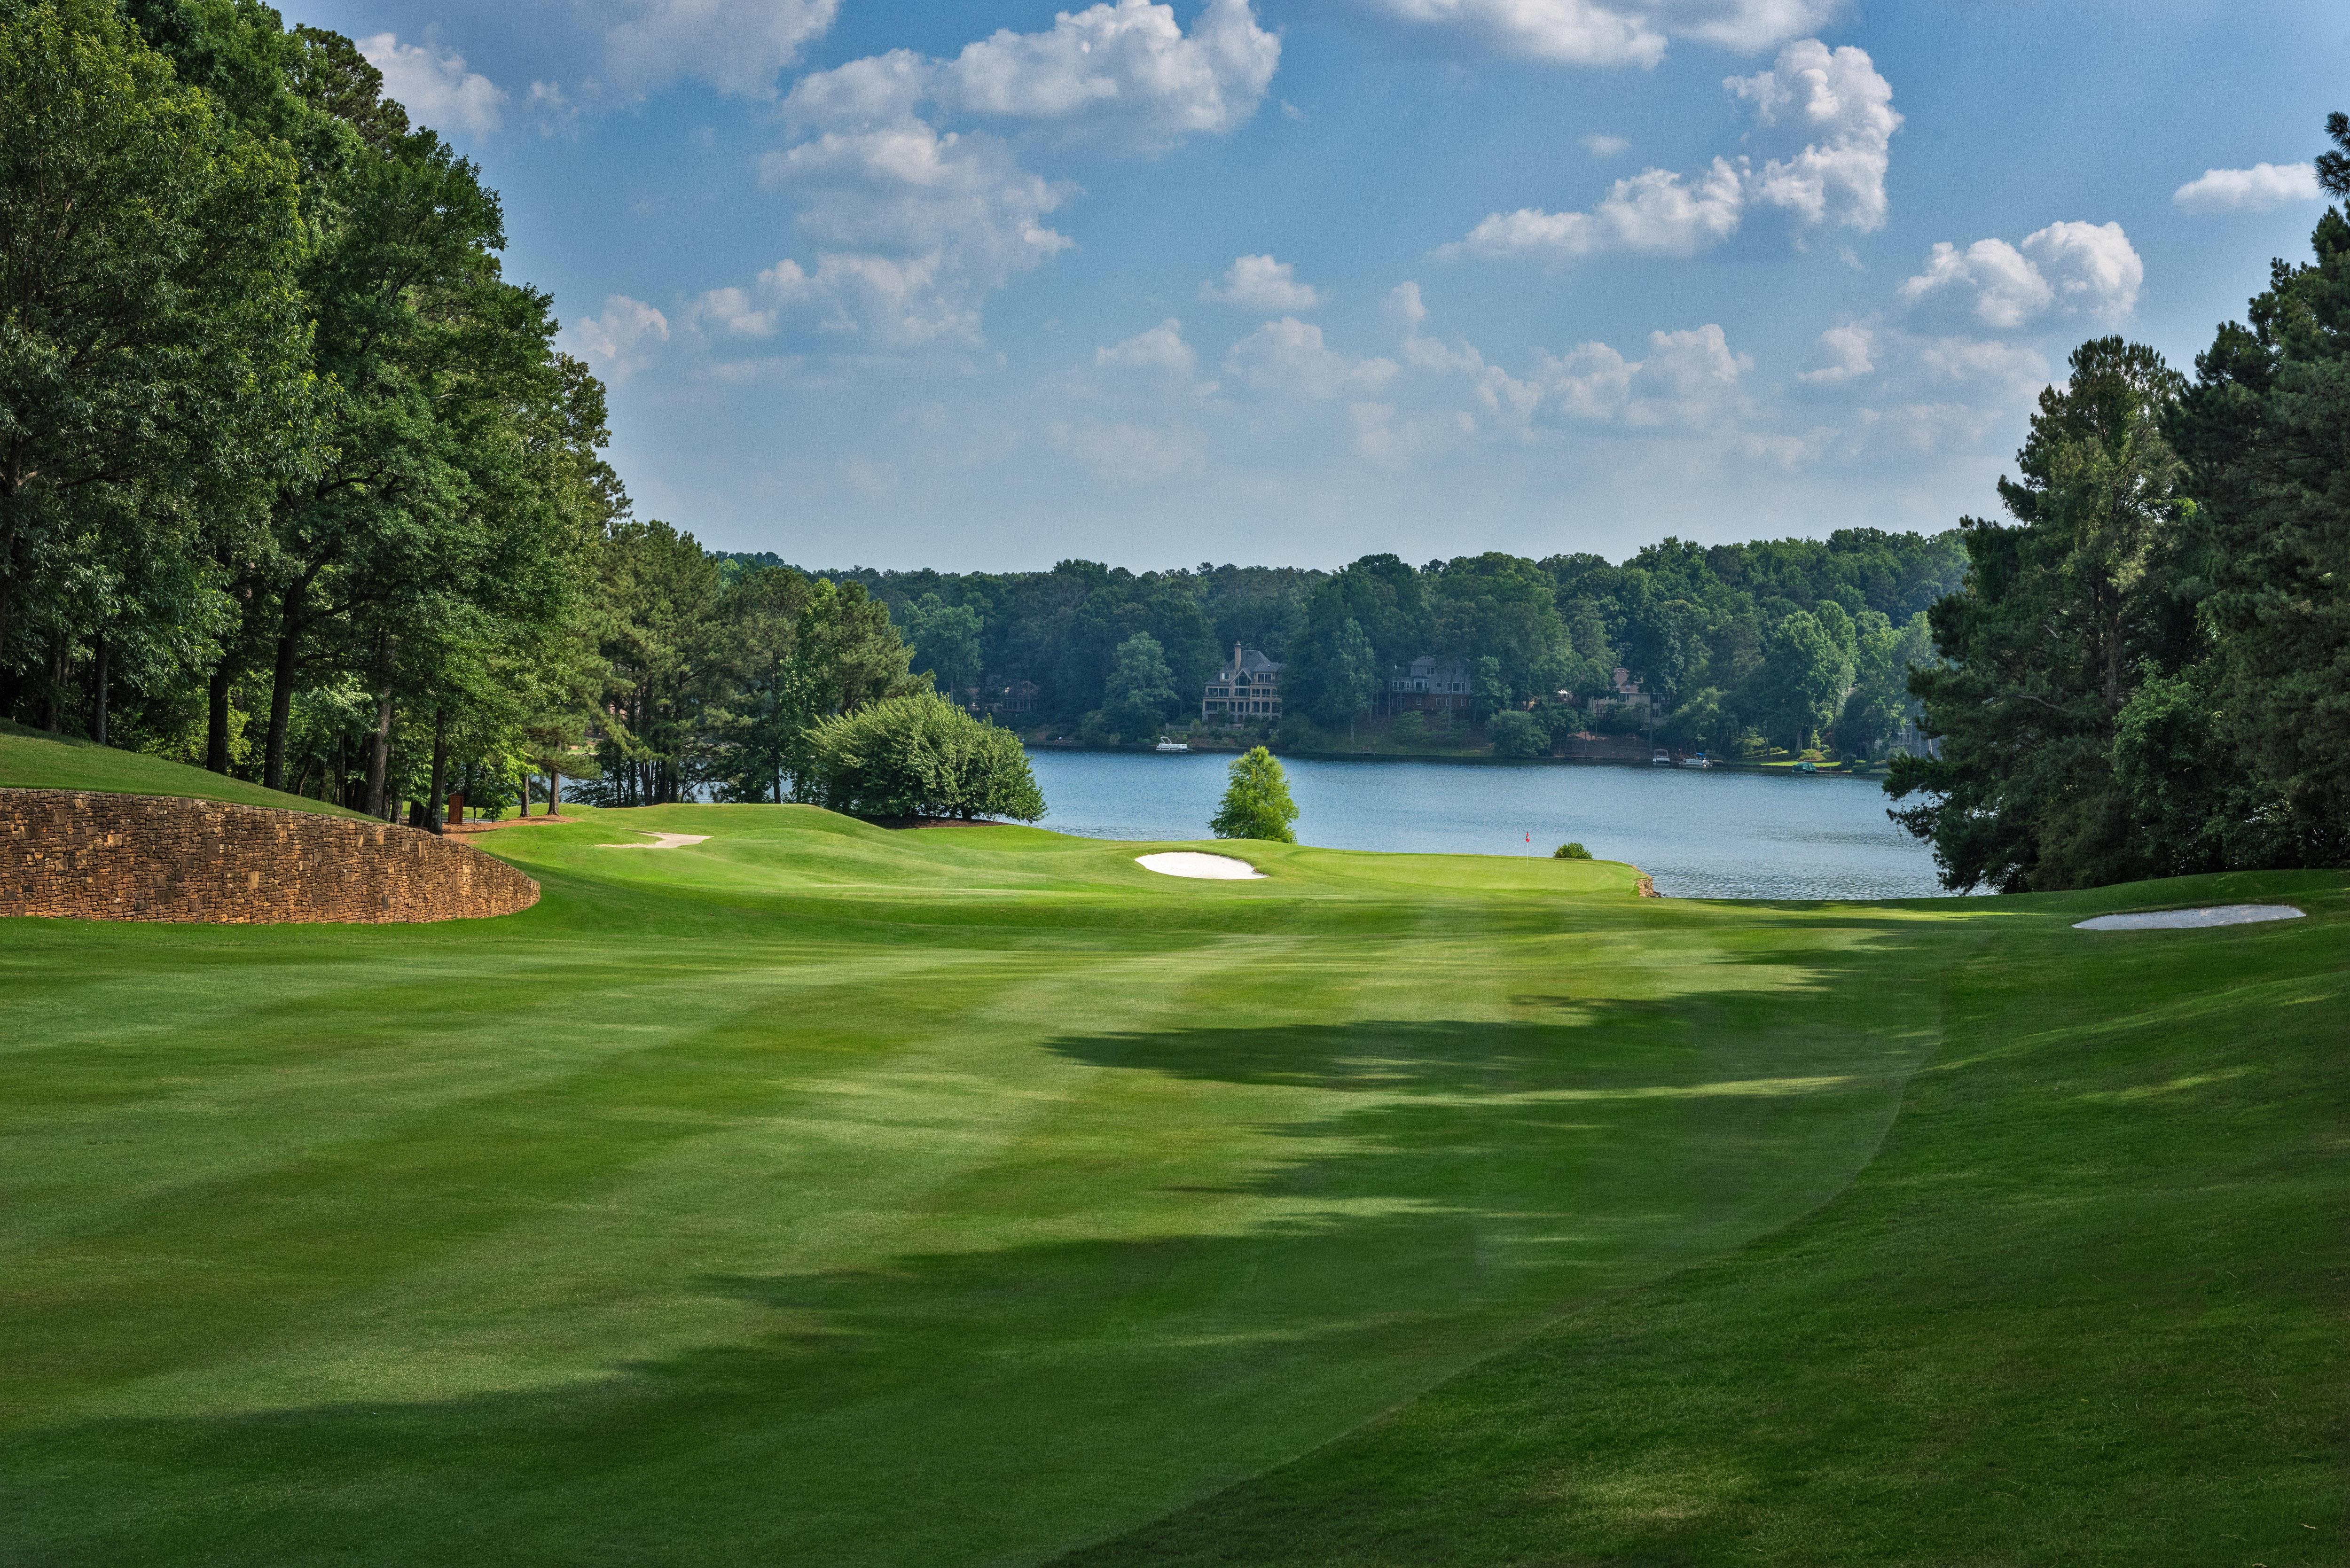 The Golf Club of Georgia image 3